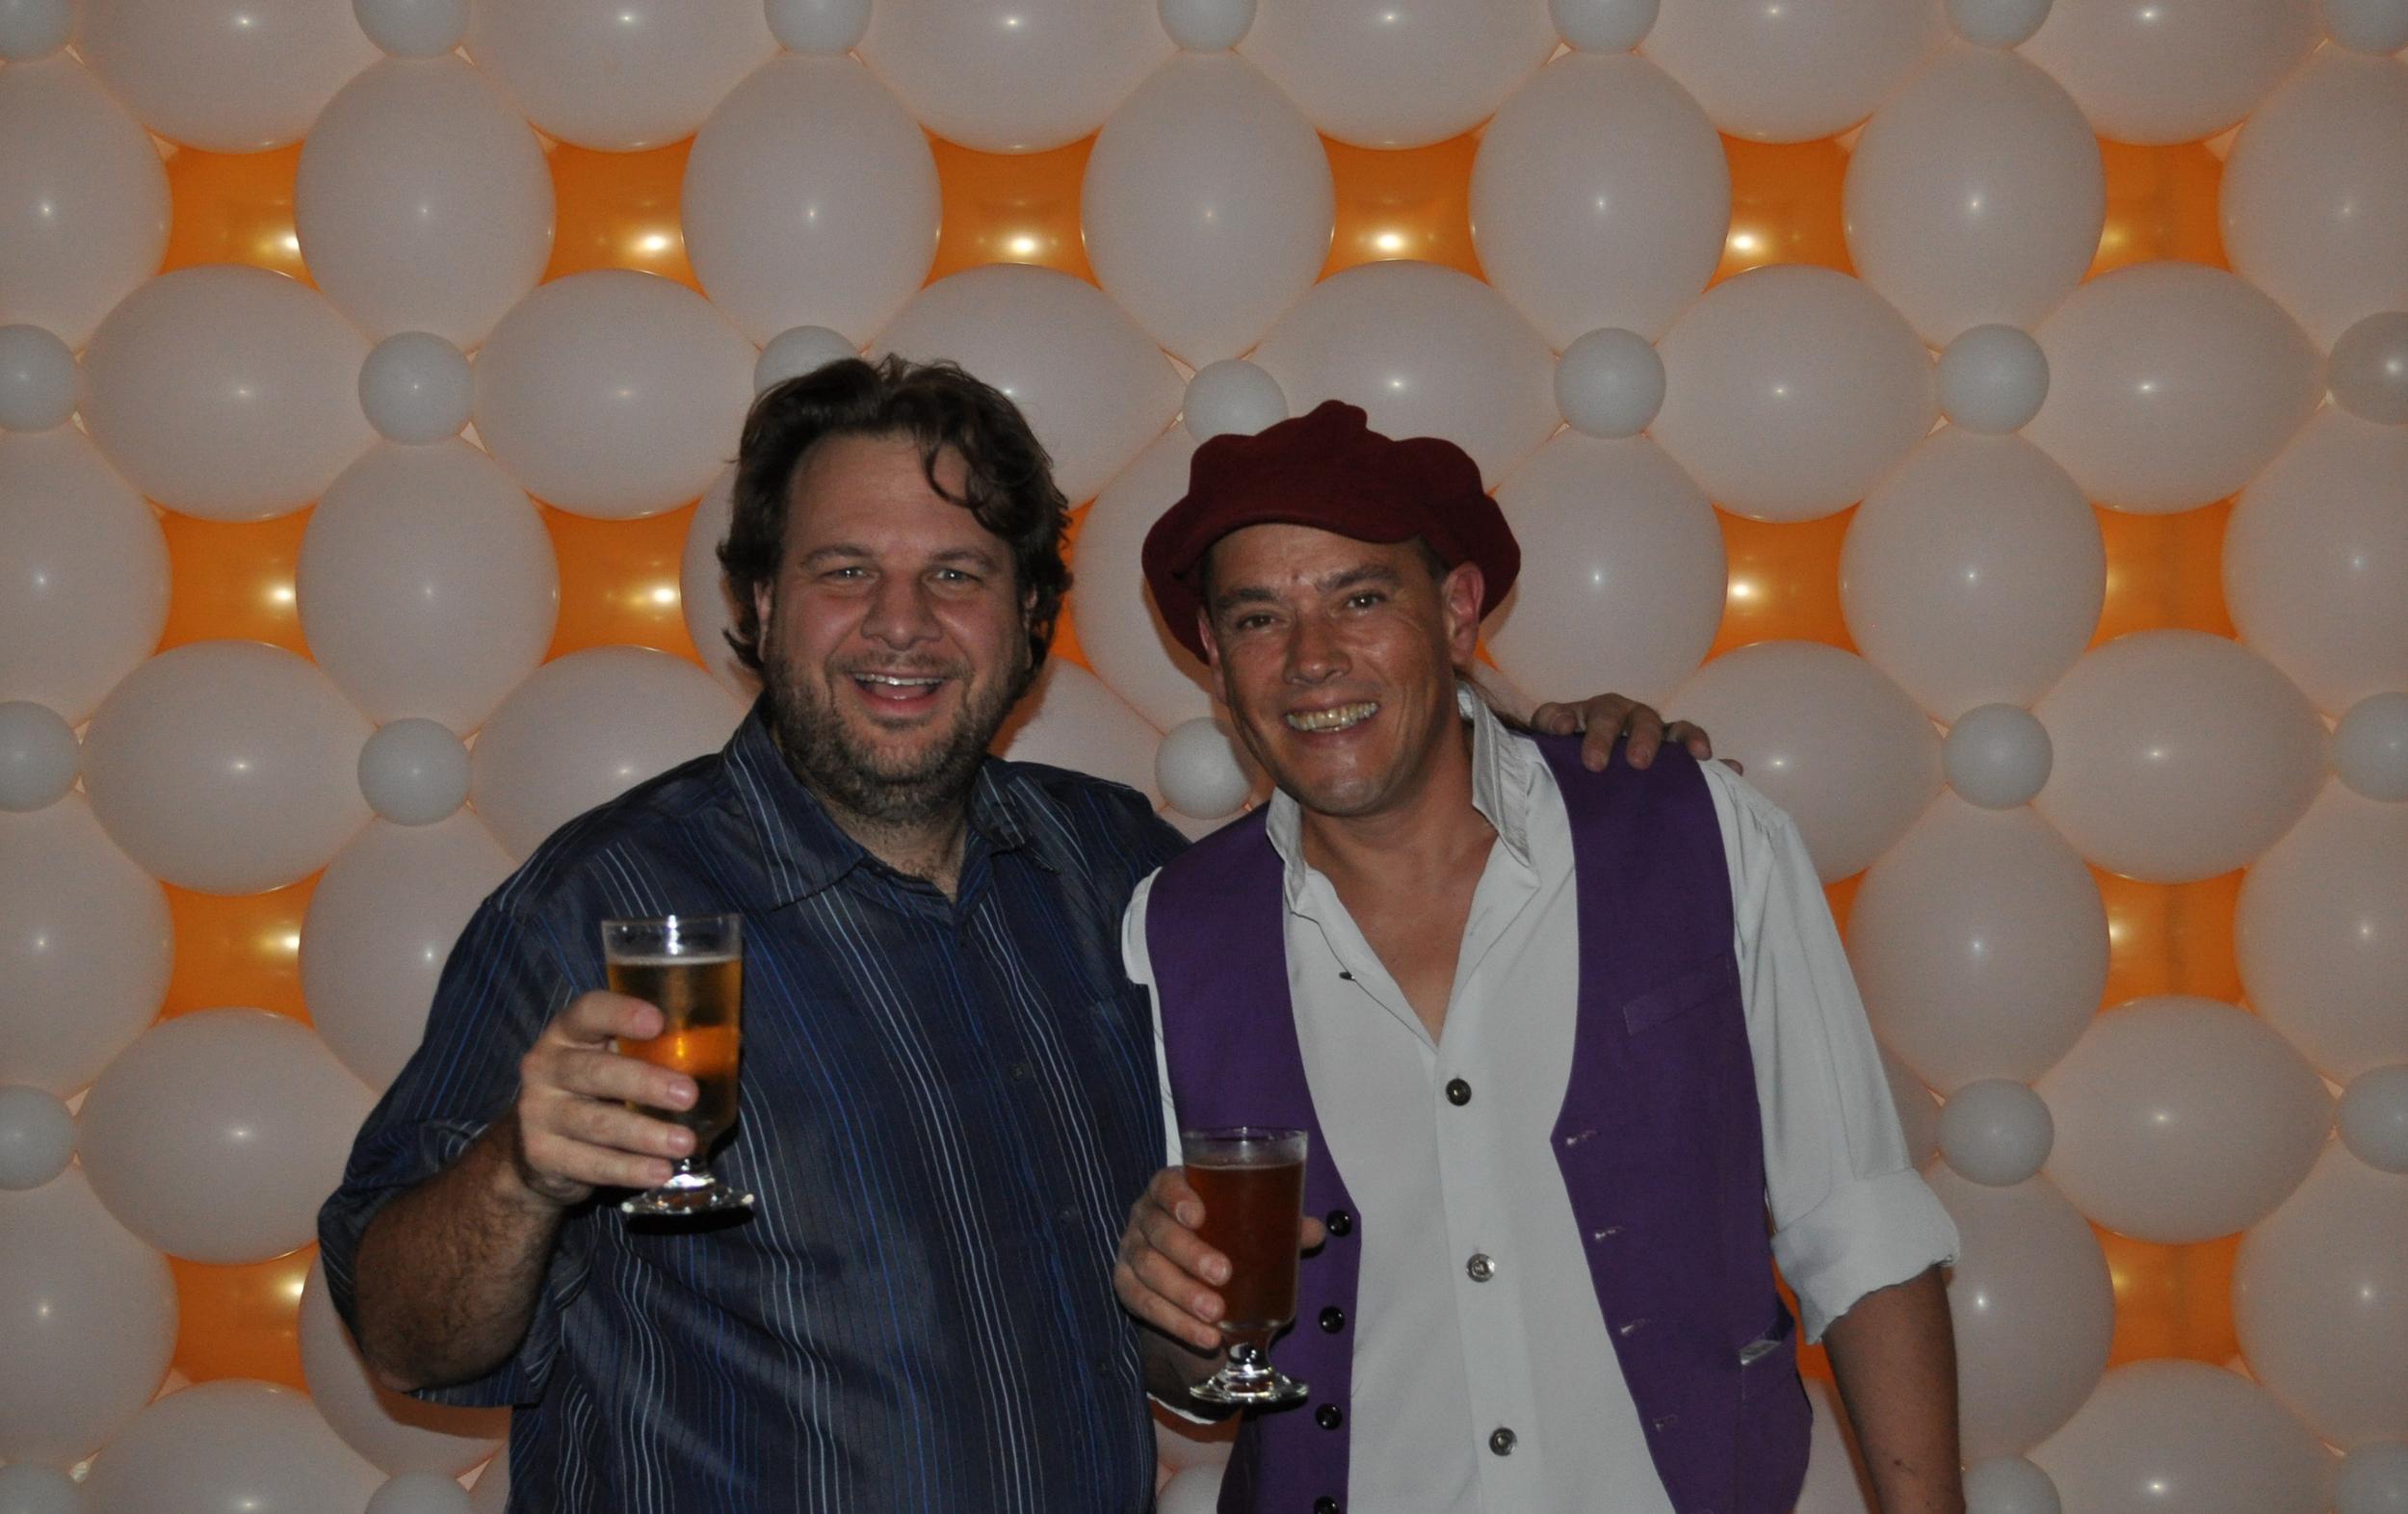 Balloon artist Bidou Charlot and myself celebrating at Ballooniversity 2012.